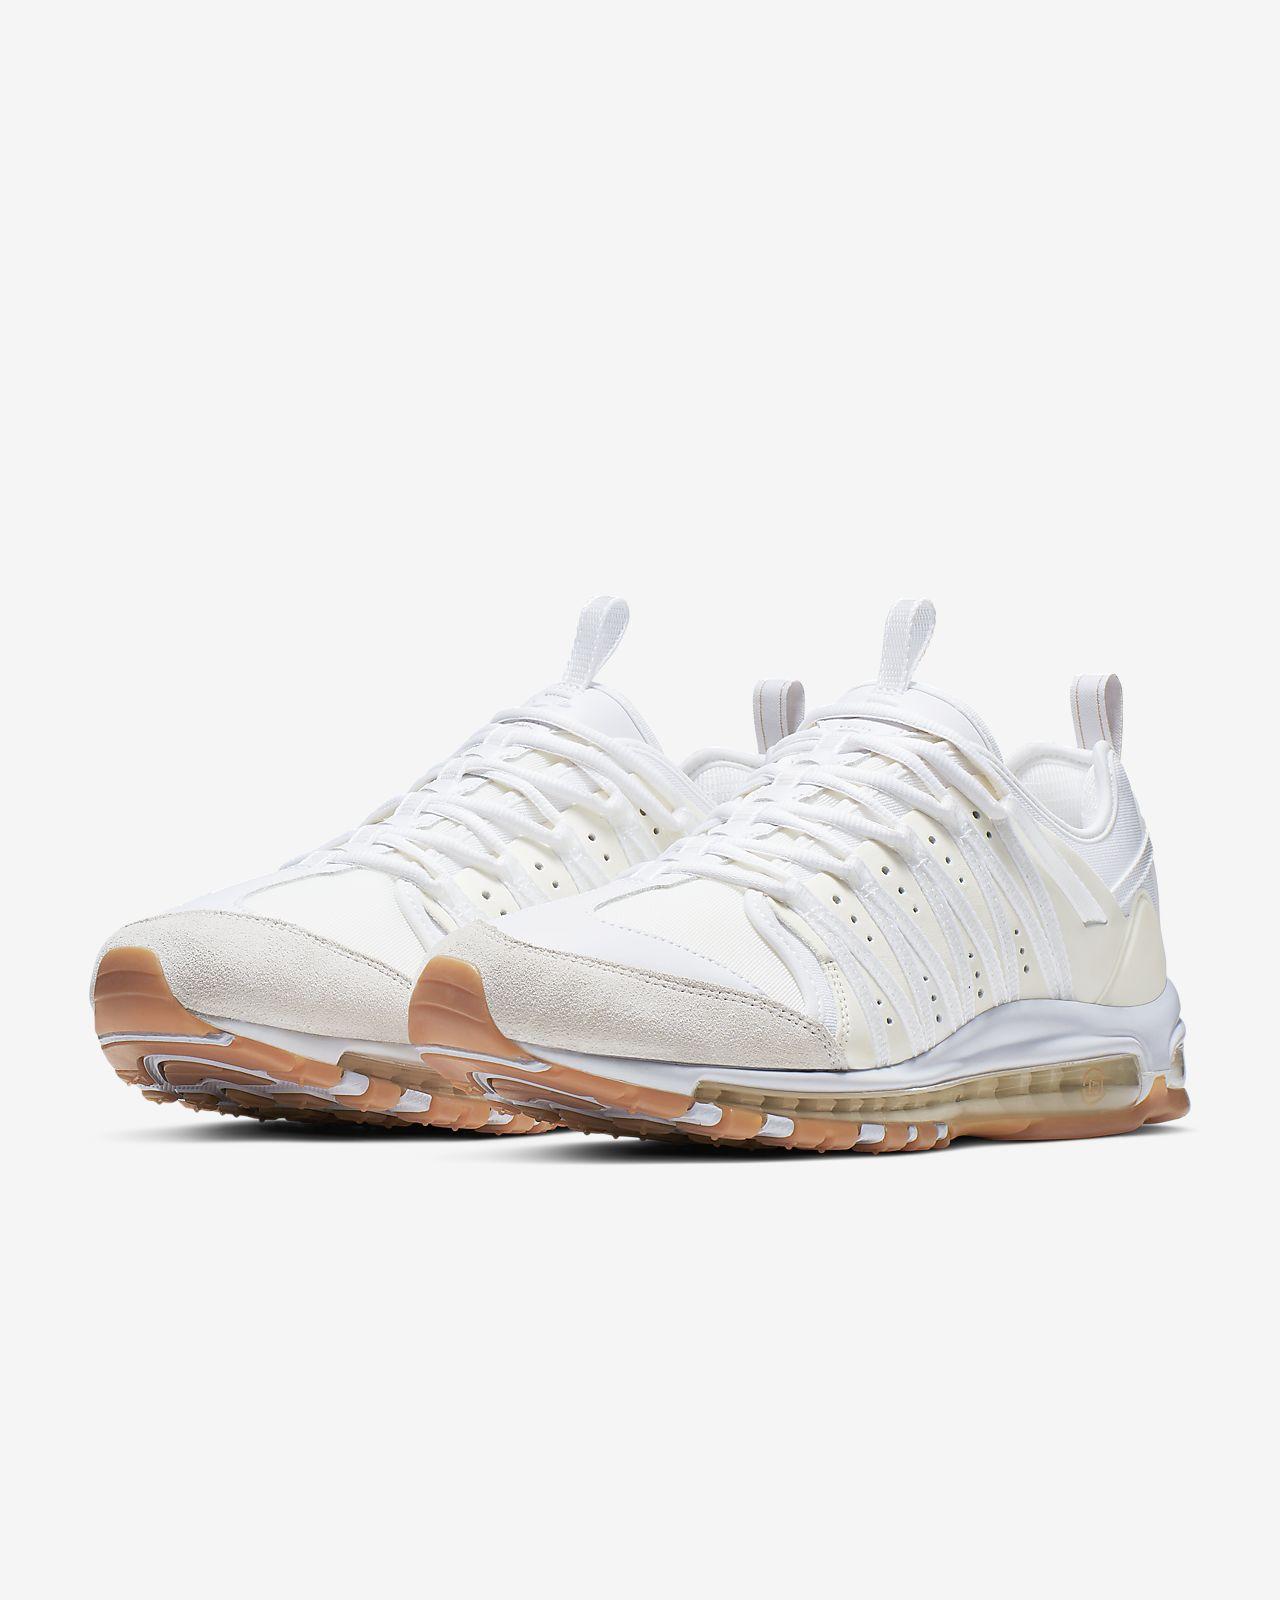 Sapatilhas Nike x CLOT Air Max Haven para homem